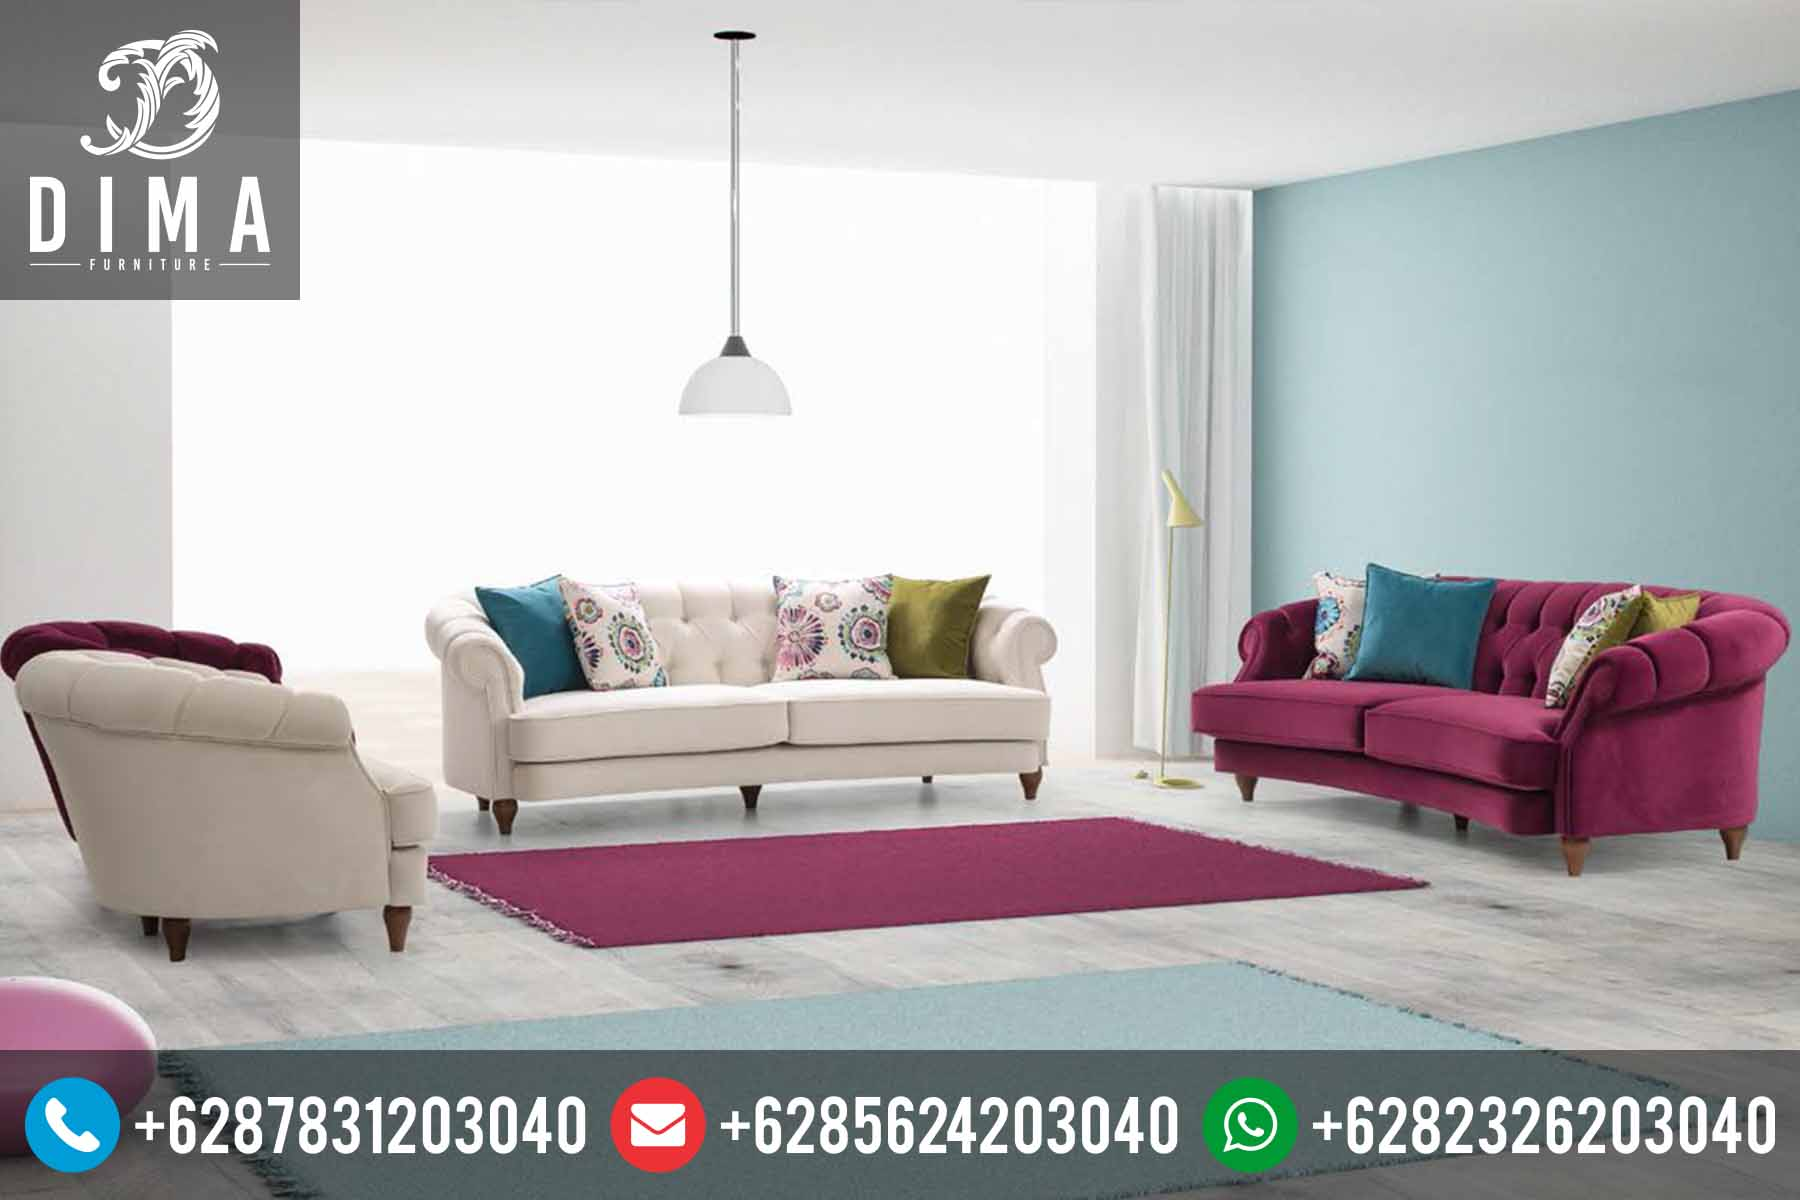 Mebel Jepara Terbaru Set Sofa Tamu Minimalis Modern Shabby Chic DF-0070